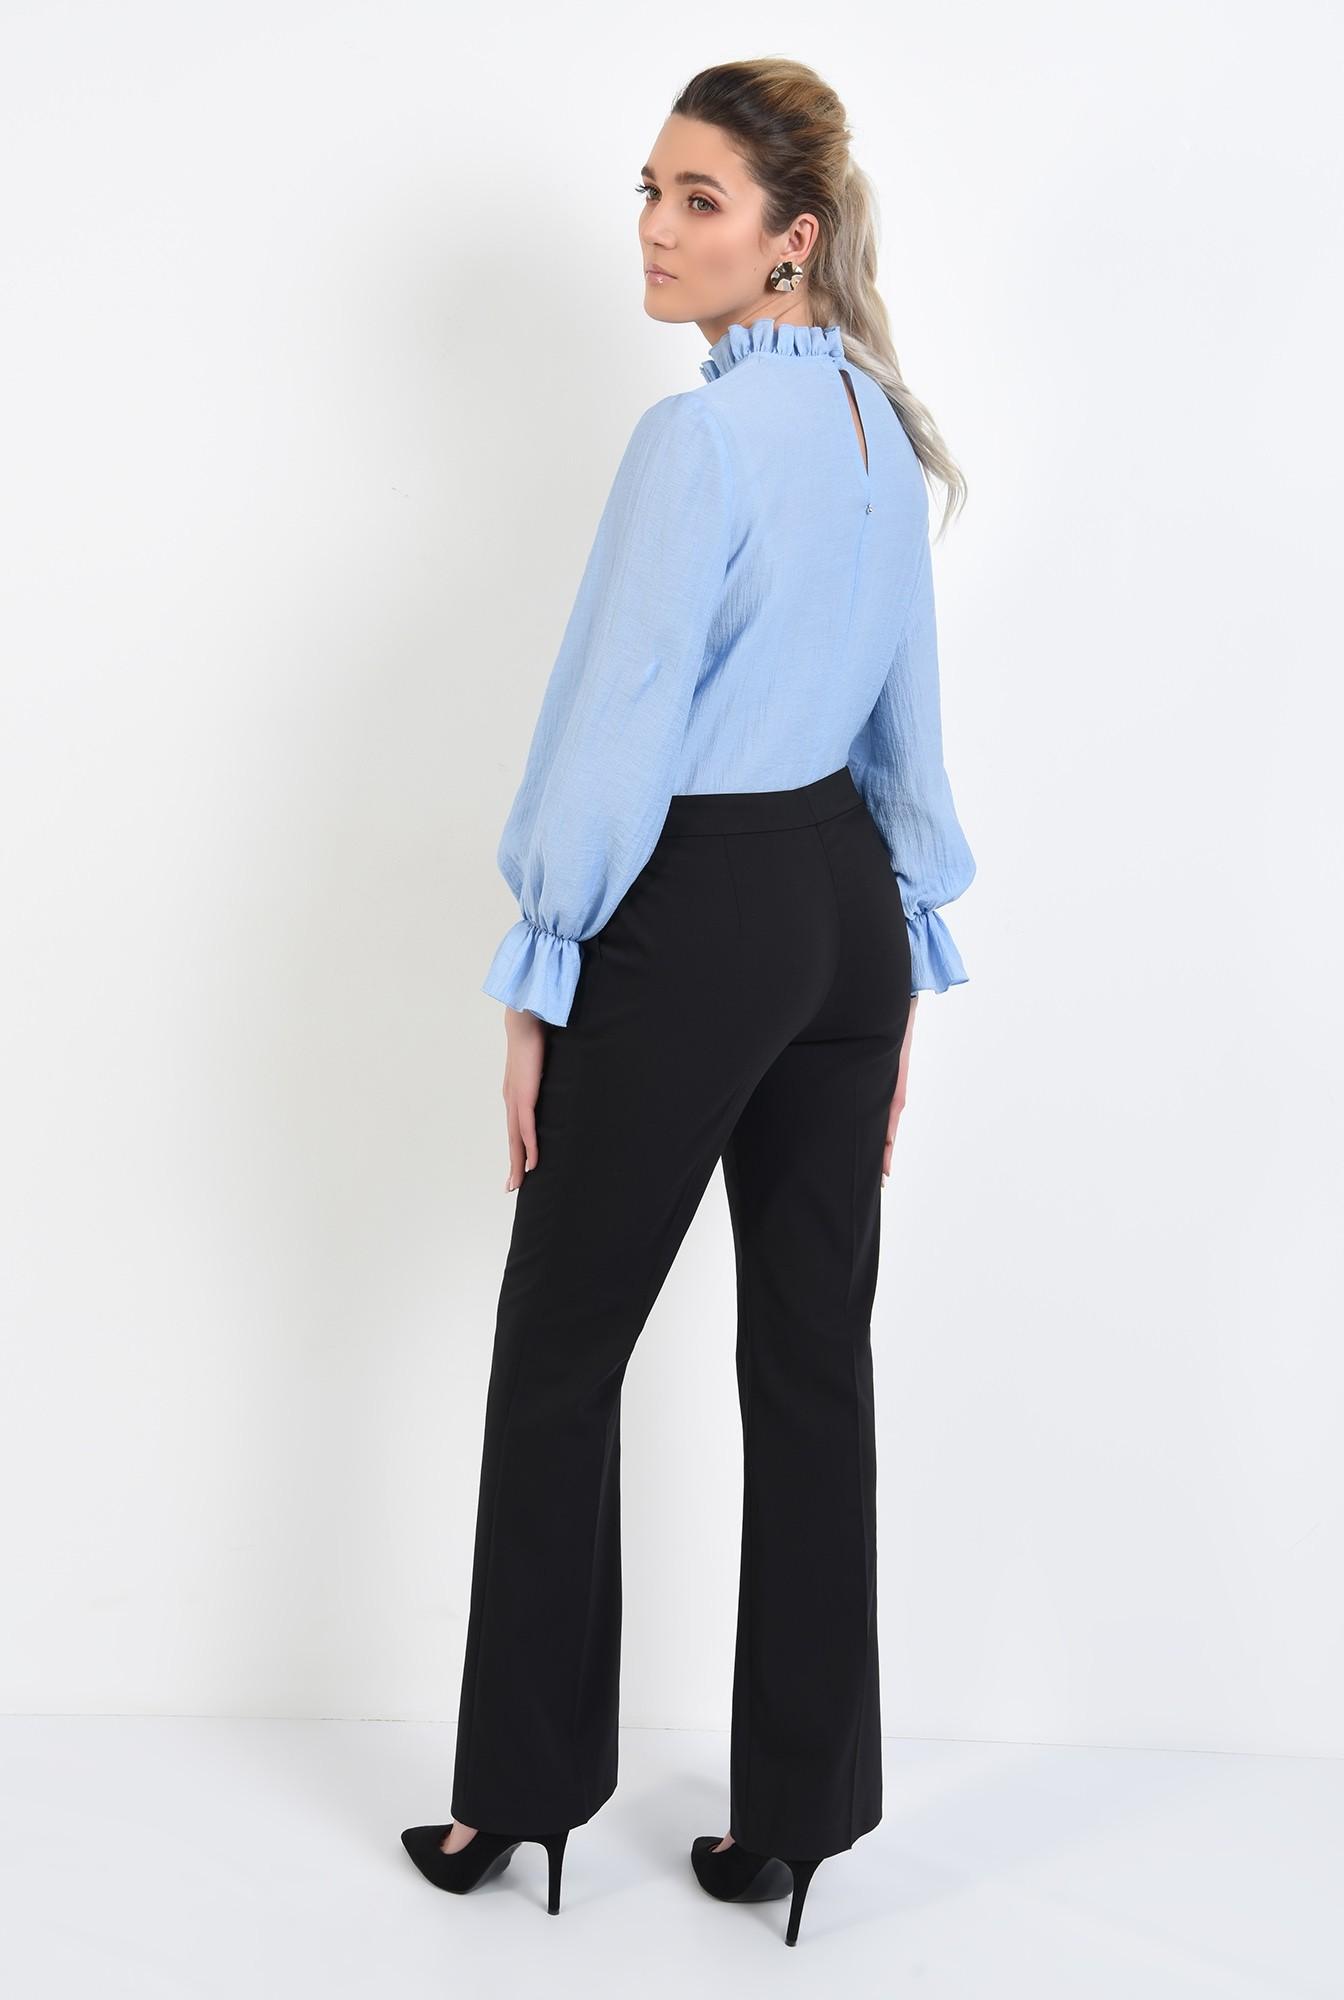 1 - bluza office, bleu, cu funda, mansete volan, guler incretit